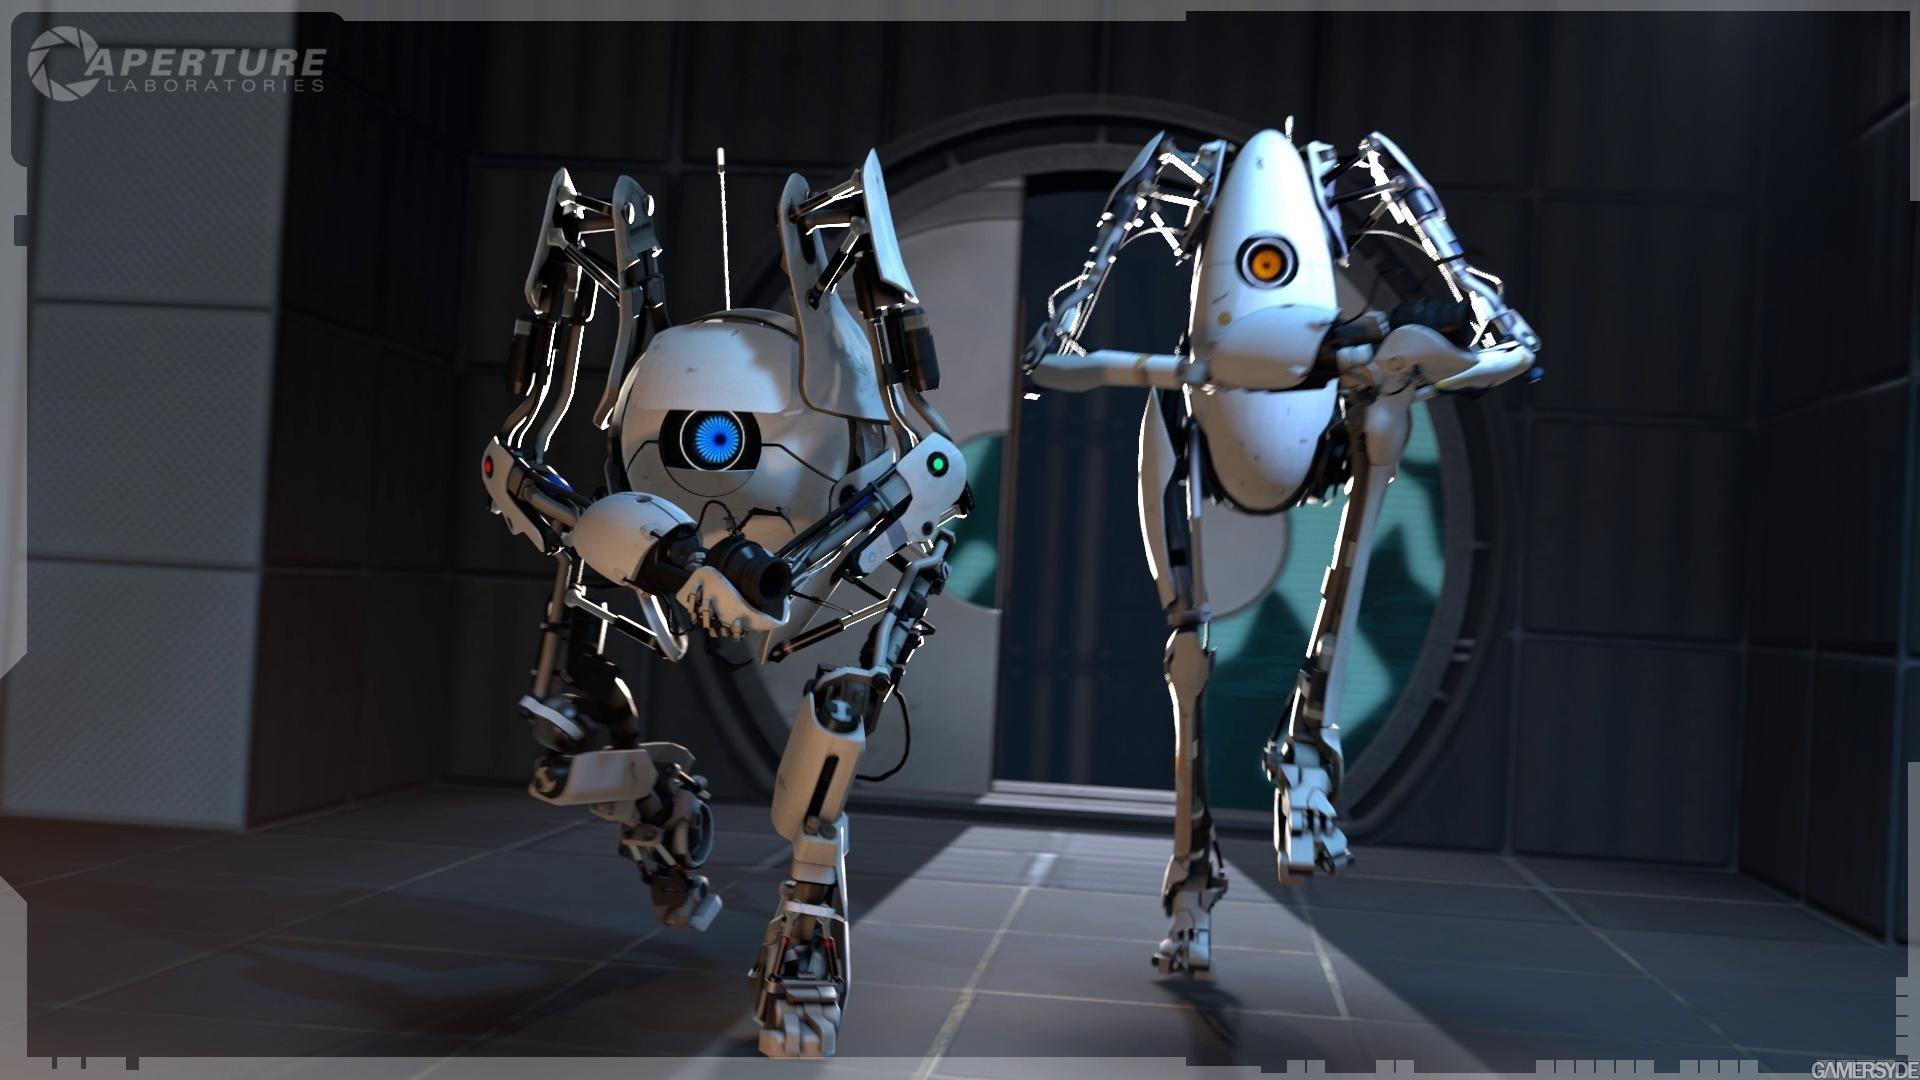 Portal 2 – https://www.fullhdwpp.com/videogames/portal/portal-2/   Full HD  Wallpapers   Pinterest   Portal, Hd wallpaper and Wallpaper